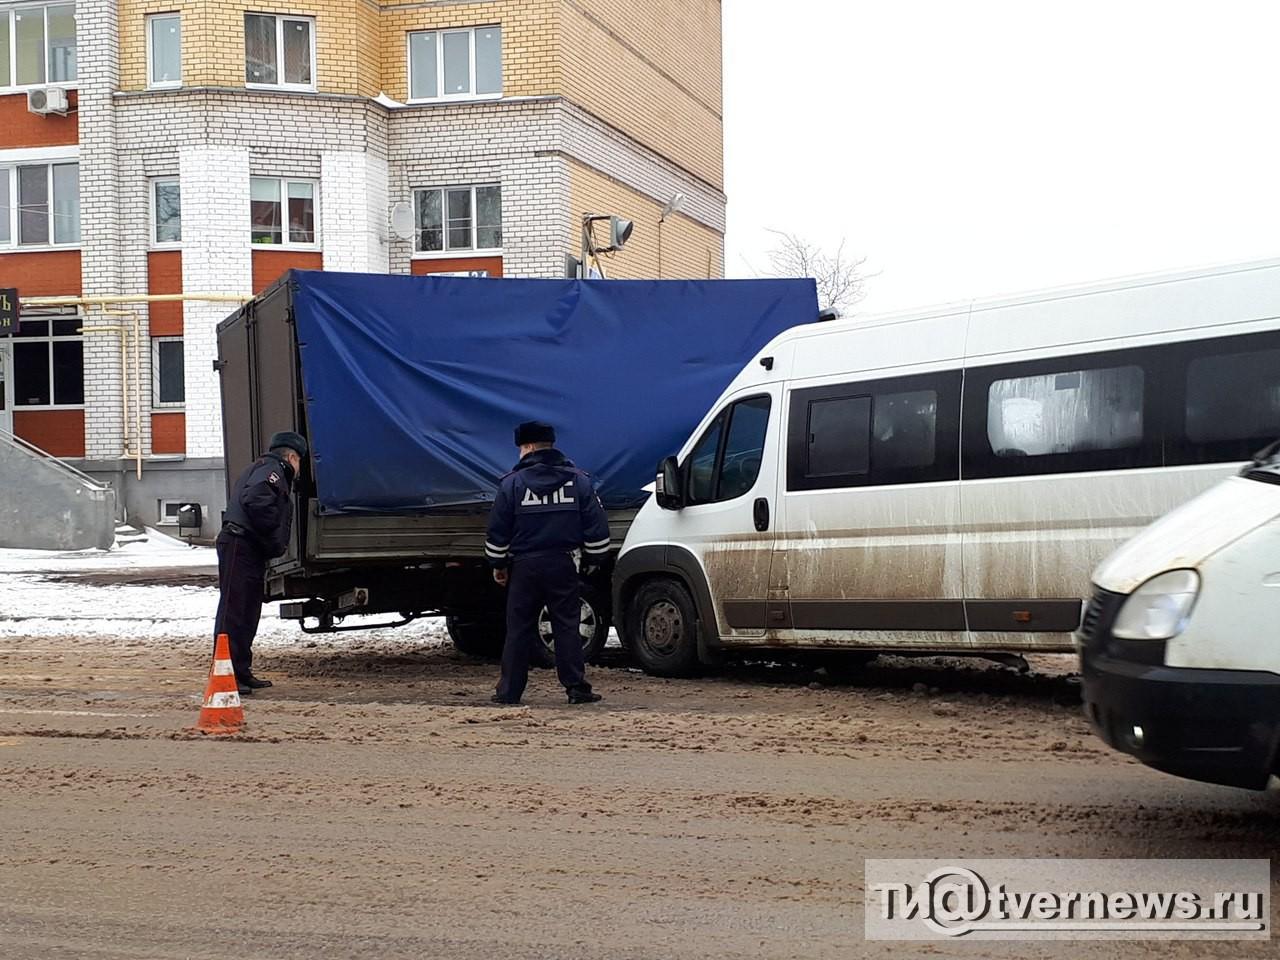 ВТвери при столкновении «Газели» имаршрутного такси пострадали 6 человек